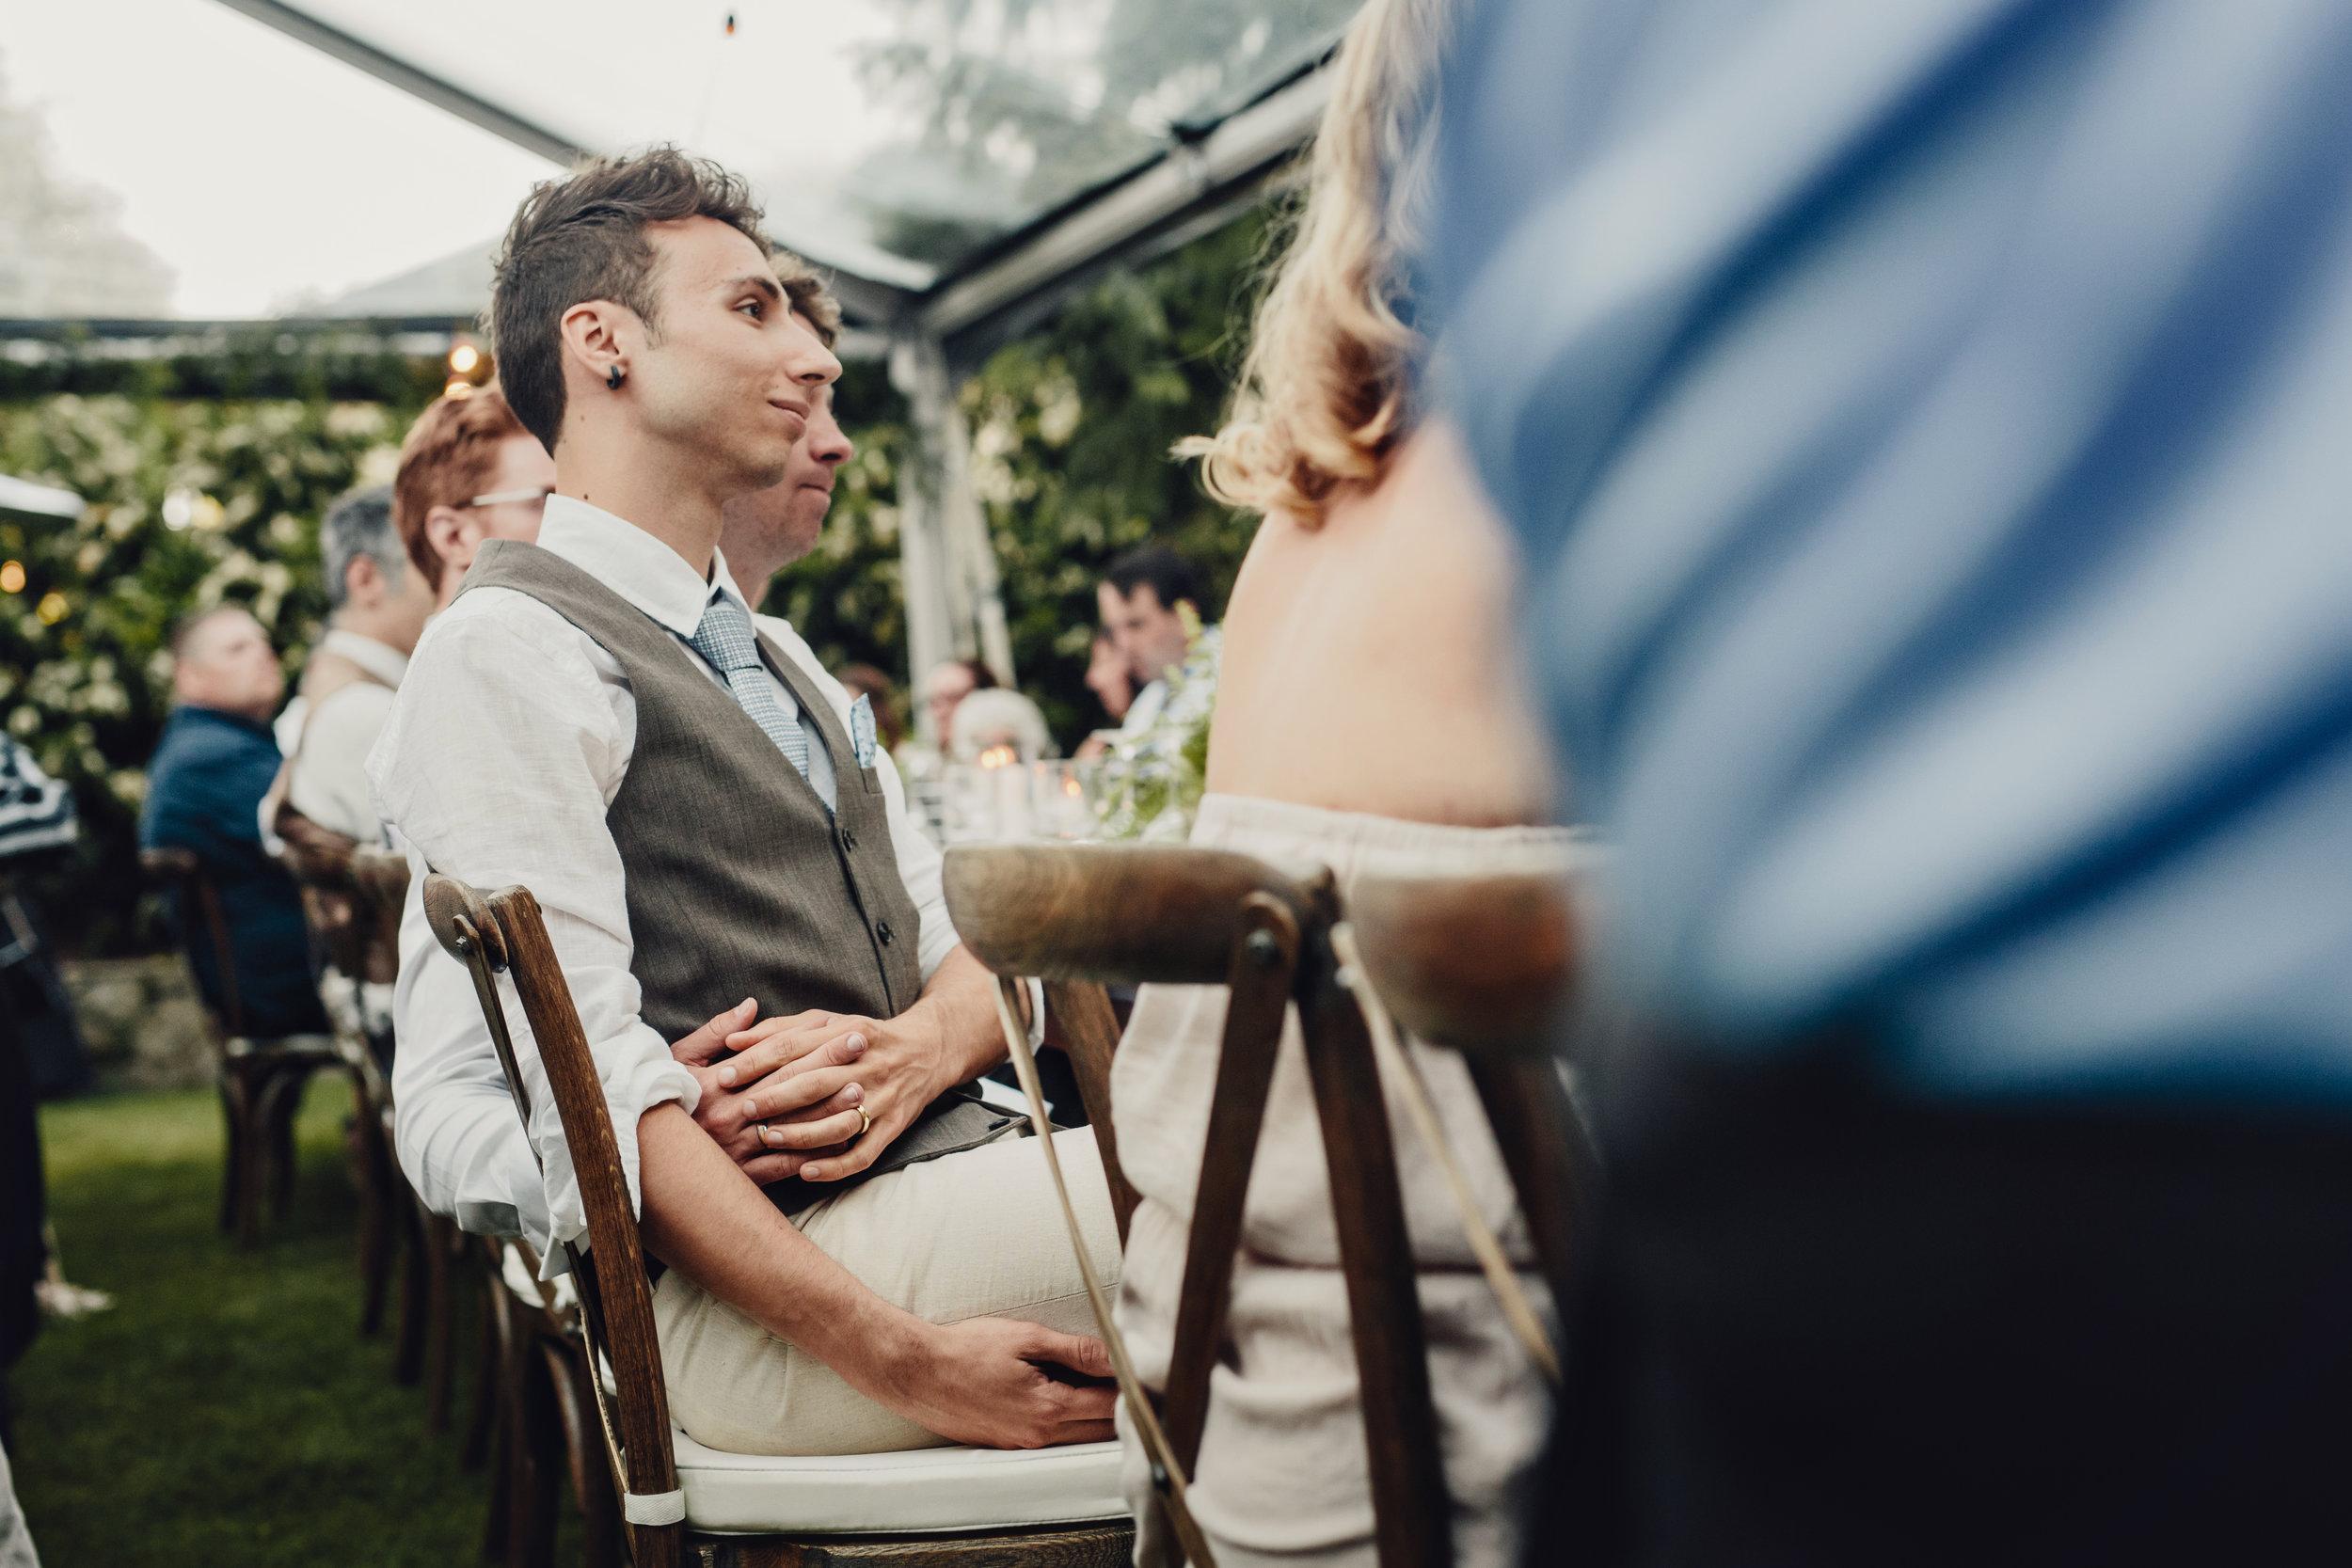 same-sex-wedding-photos-6.jpg